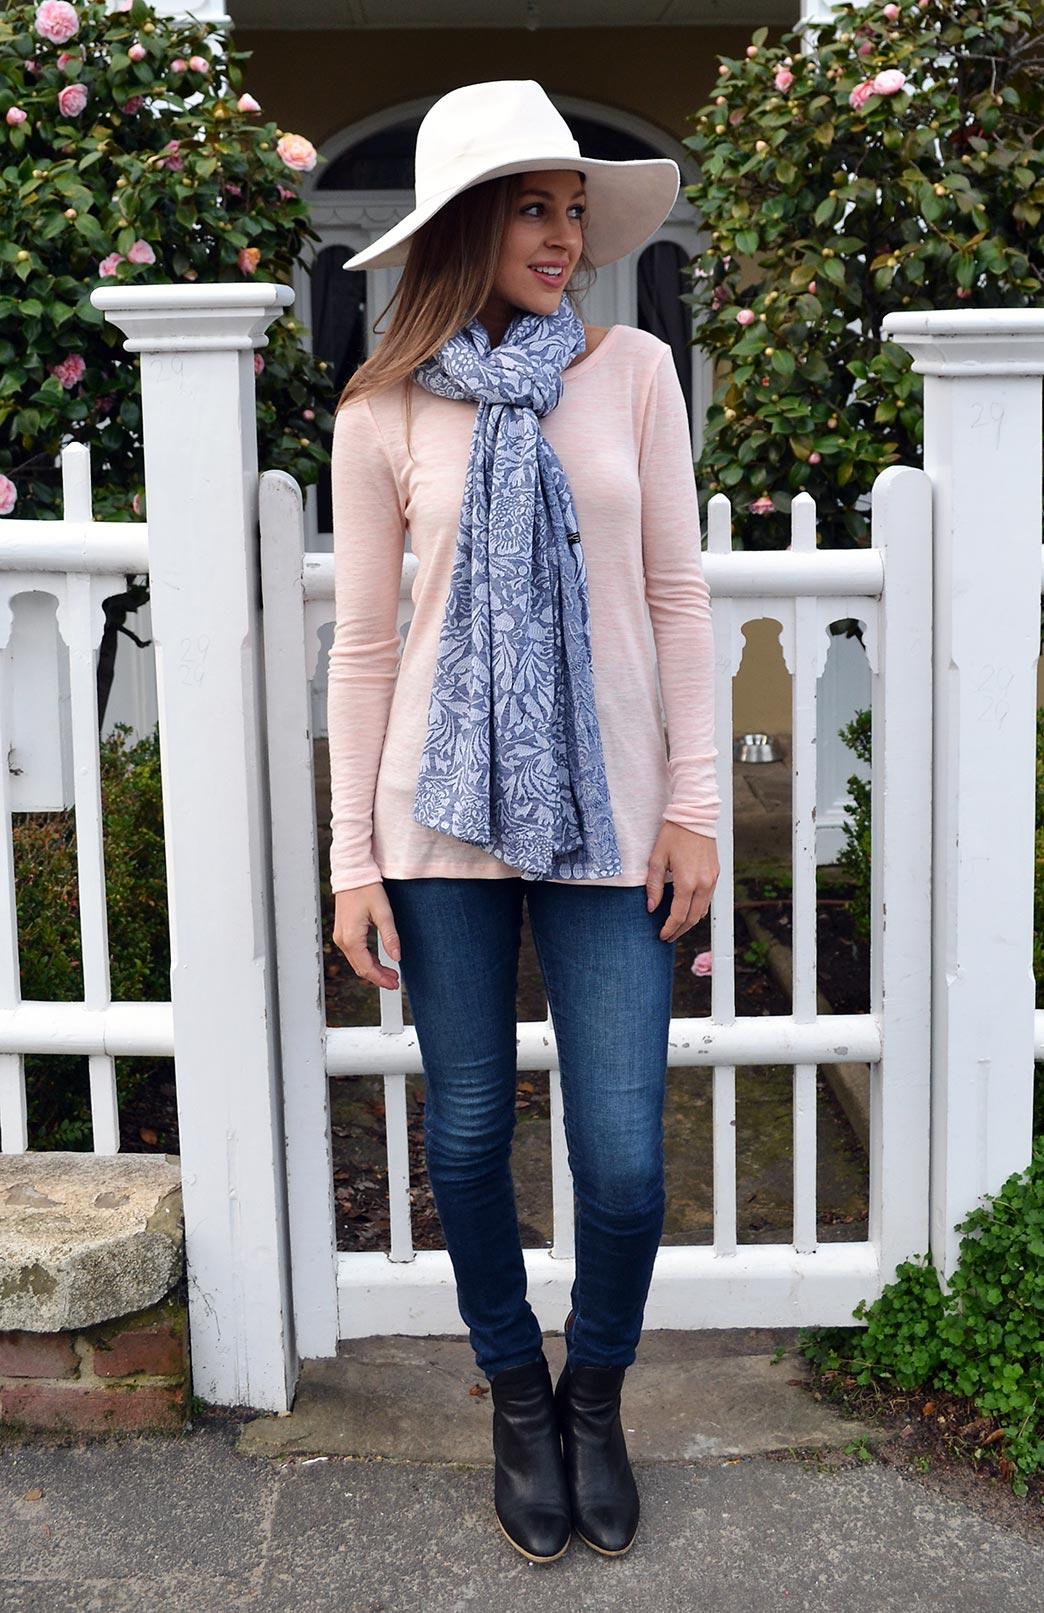 Rose Top - Women's Pink Marl Long Sleeve Wool Top - Smitten Merino Tasmania Australia